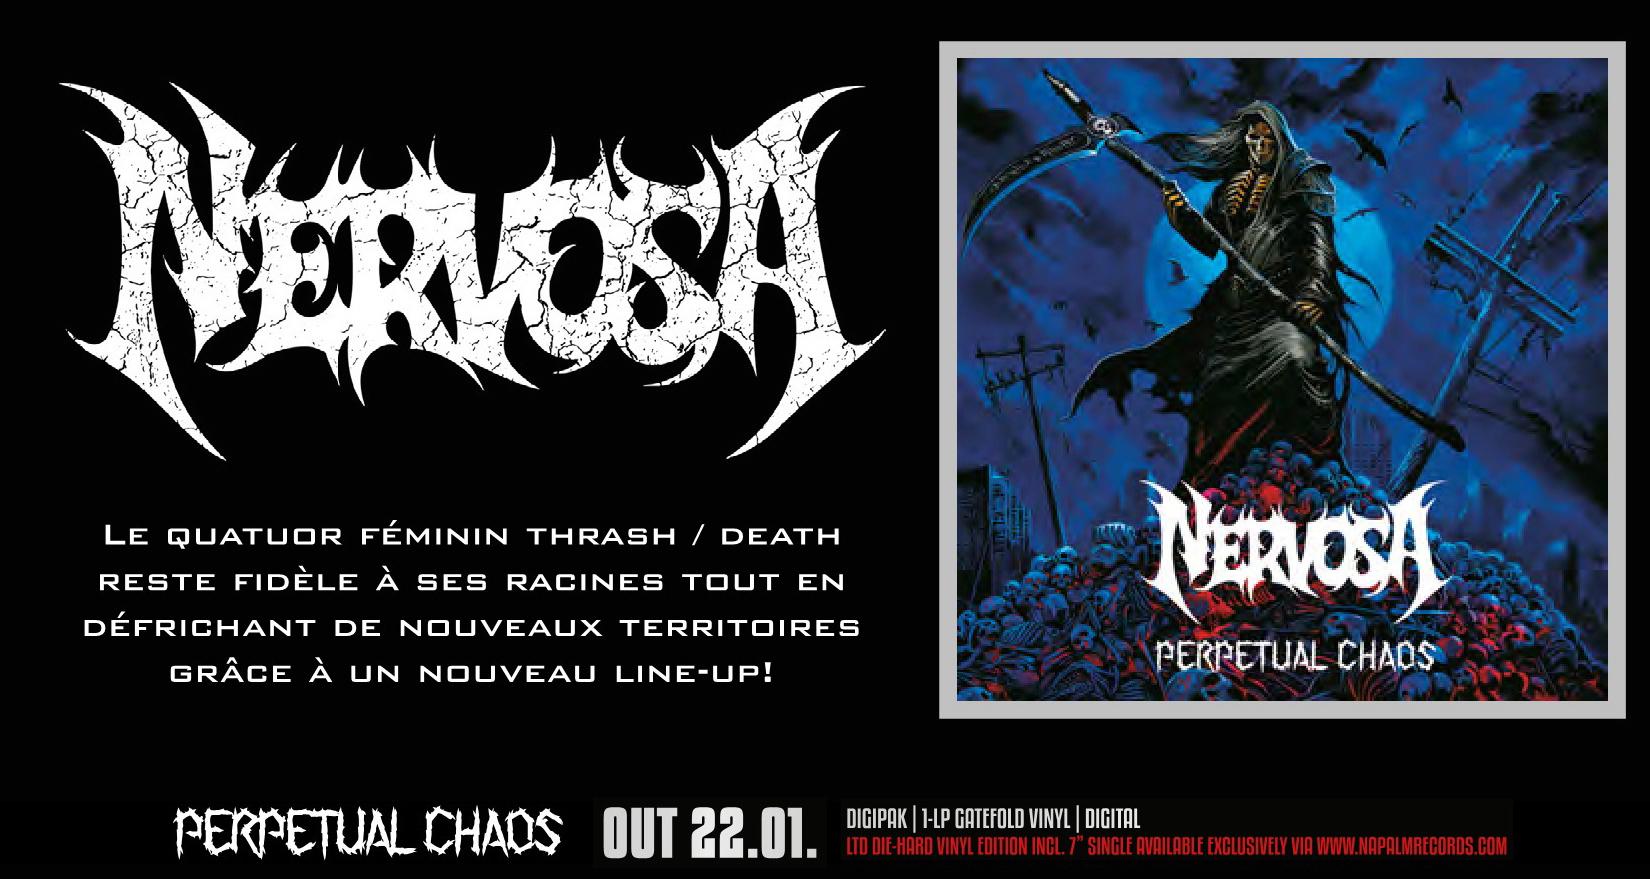 NERVOSA Perpetual Chaos (2021) Thrash Metal Brésil Metal_12